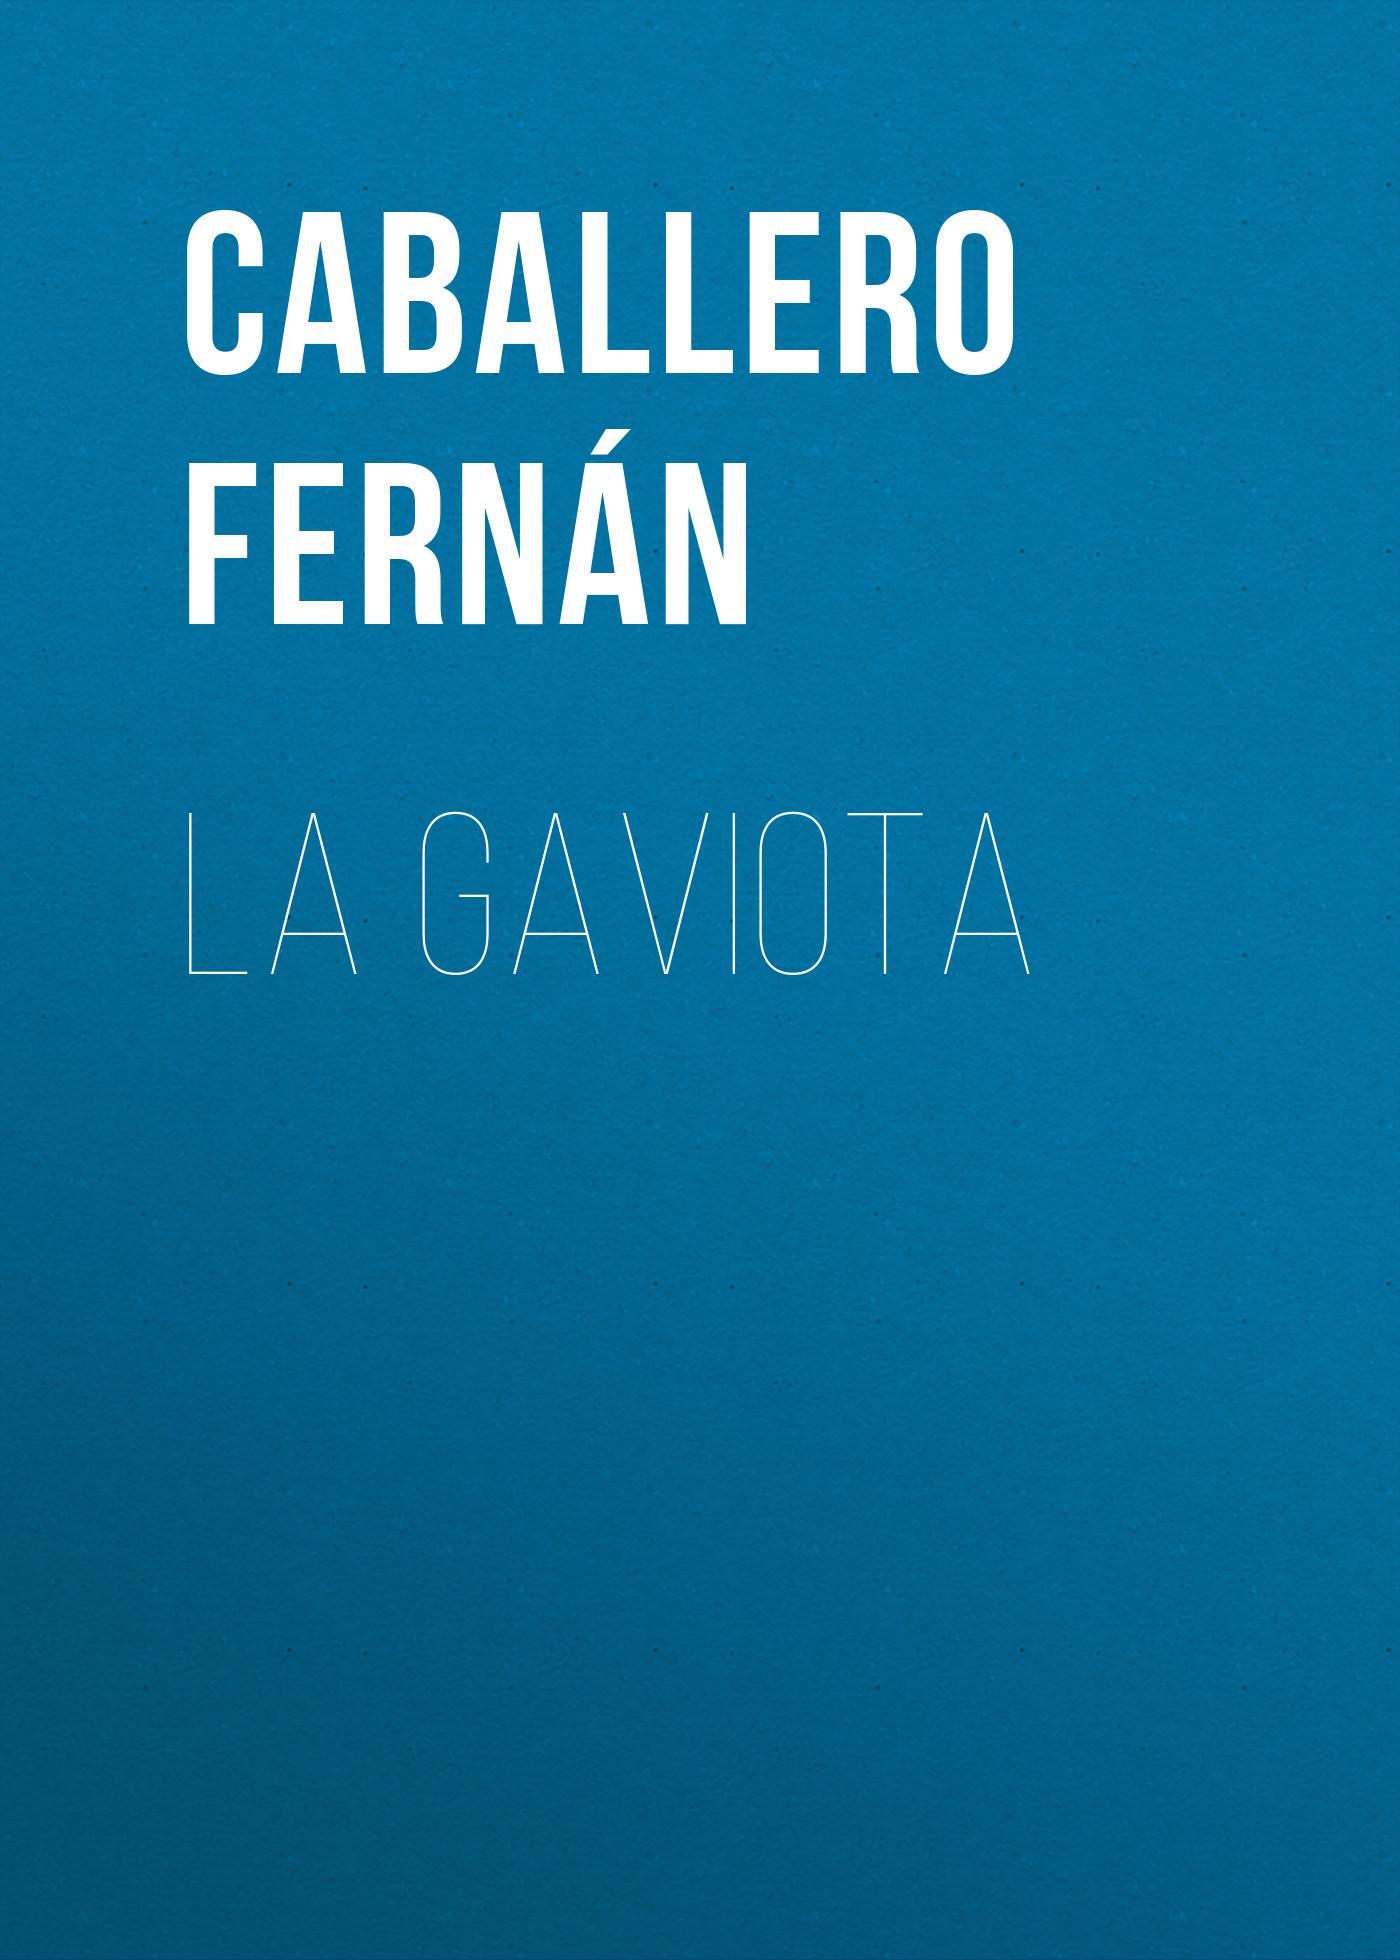 Caballero Fernán La Gaviota shirt men s short sleeve berthier caballero 22723 blue